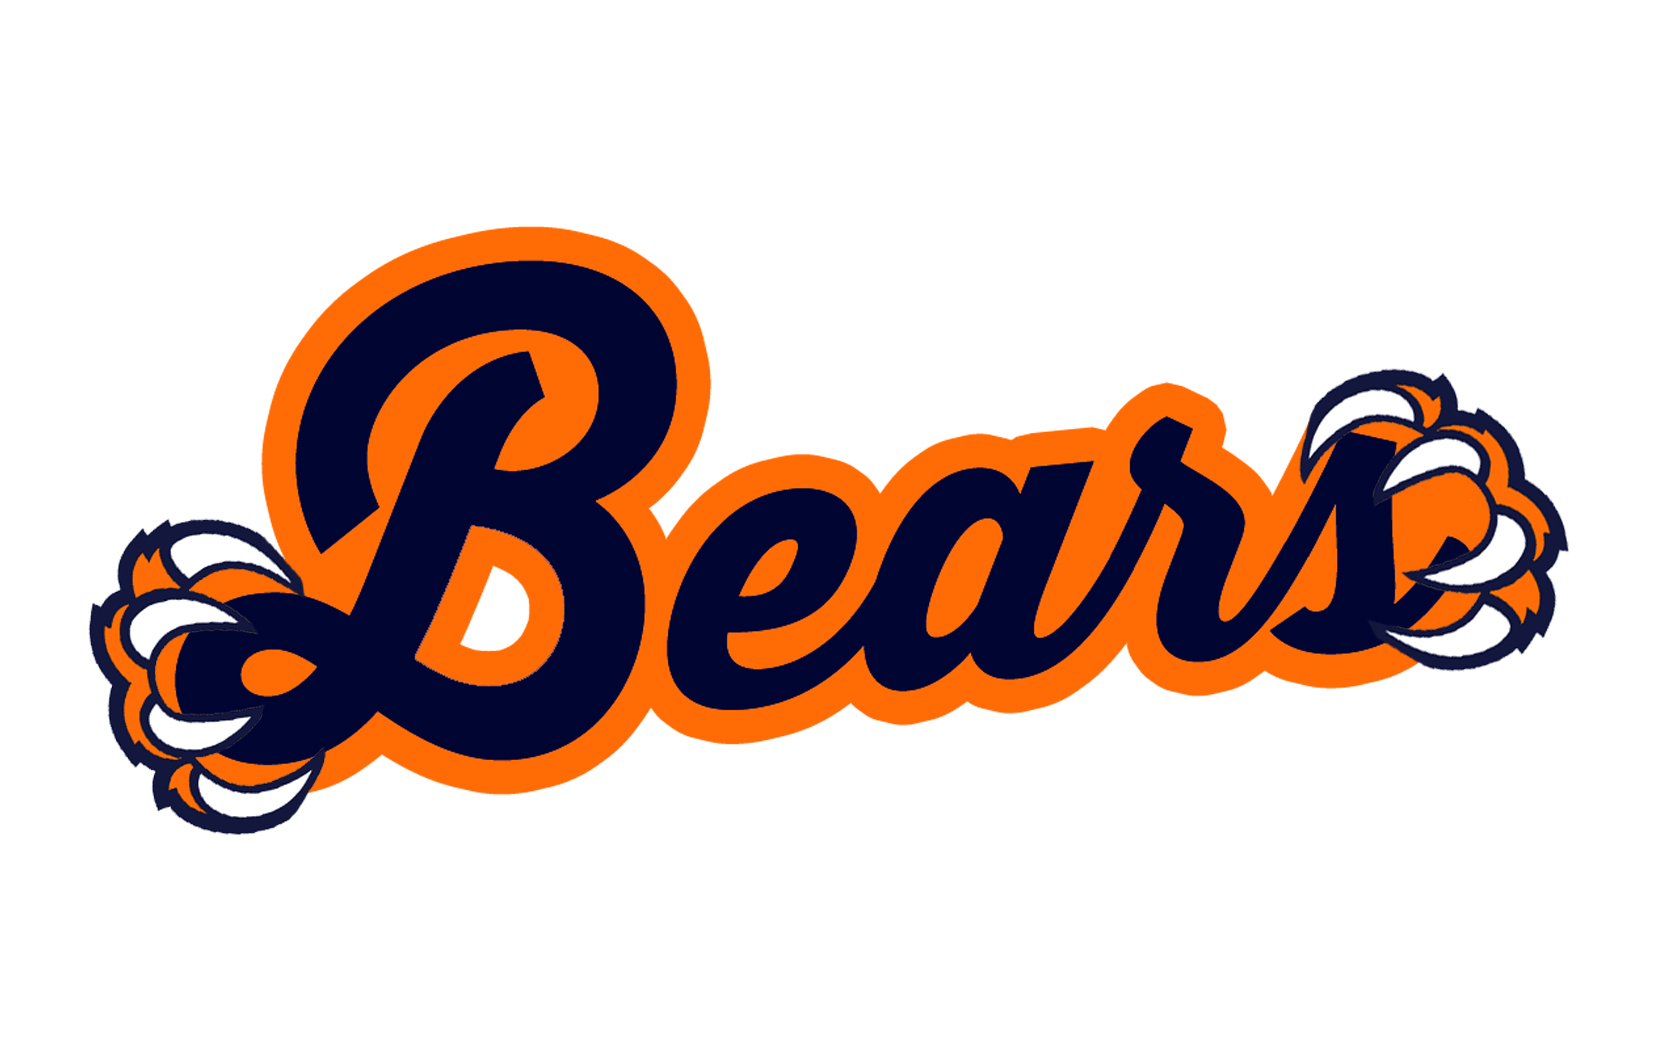 Bear claw sports logo - photo#1